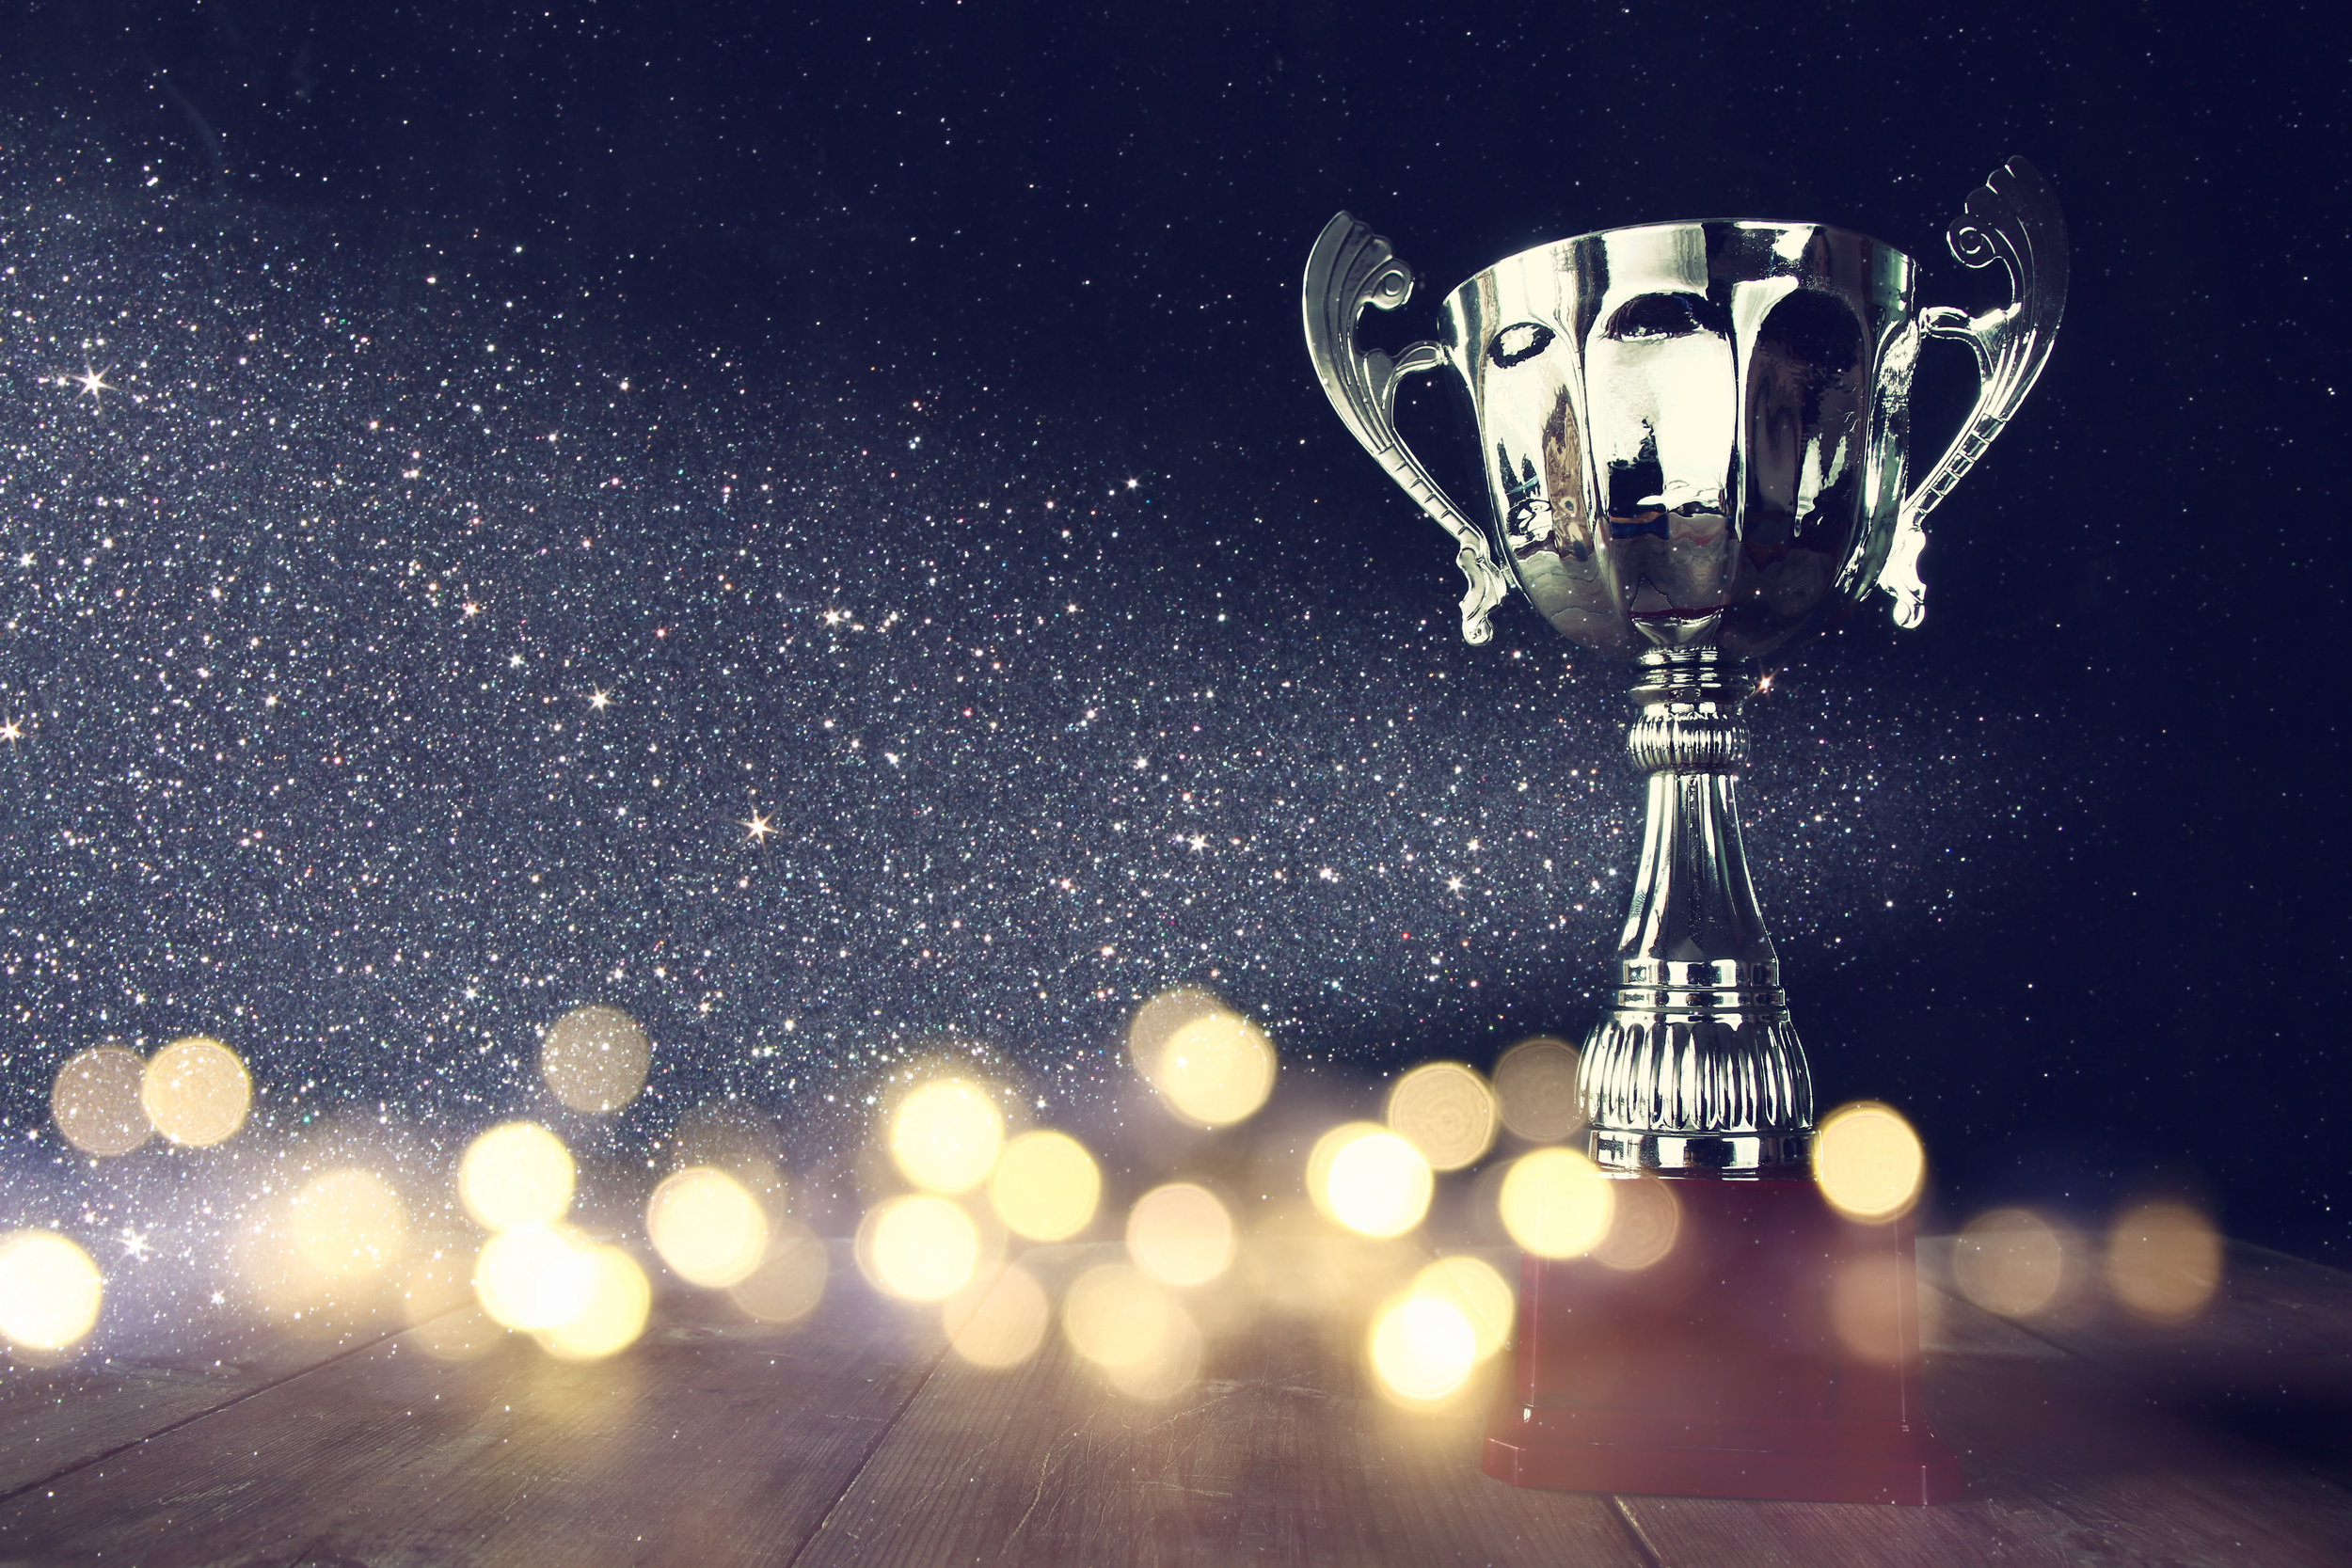 bespoke-trophy-trophies-awards-makers-red-penguin-uk